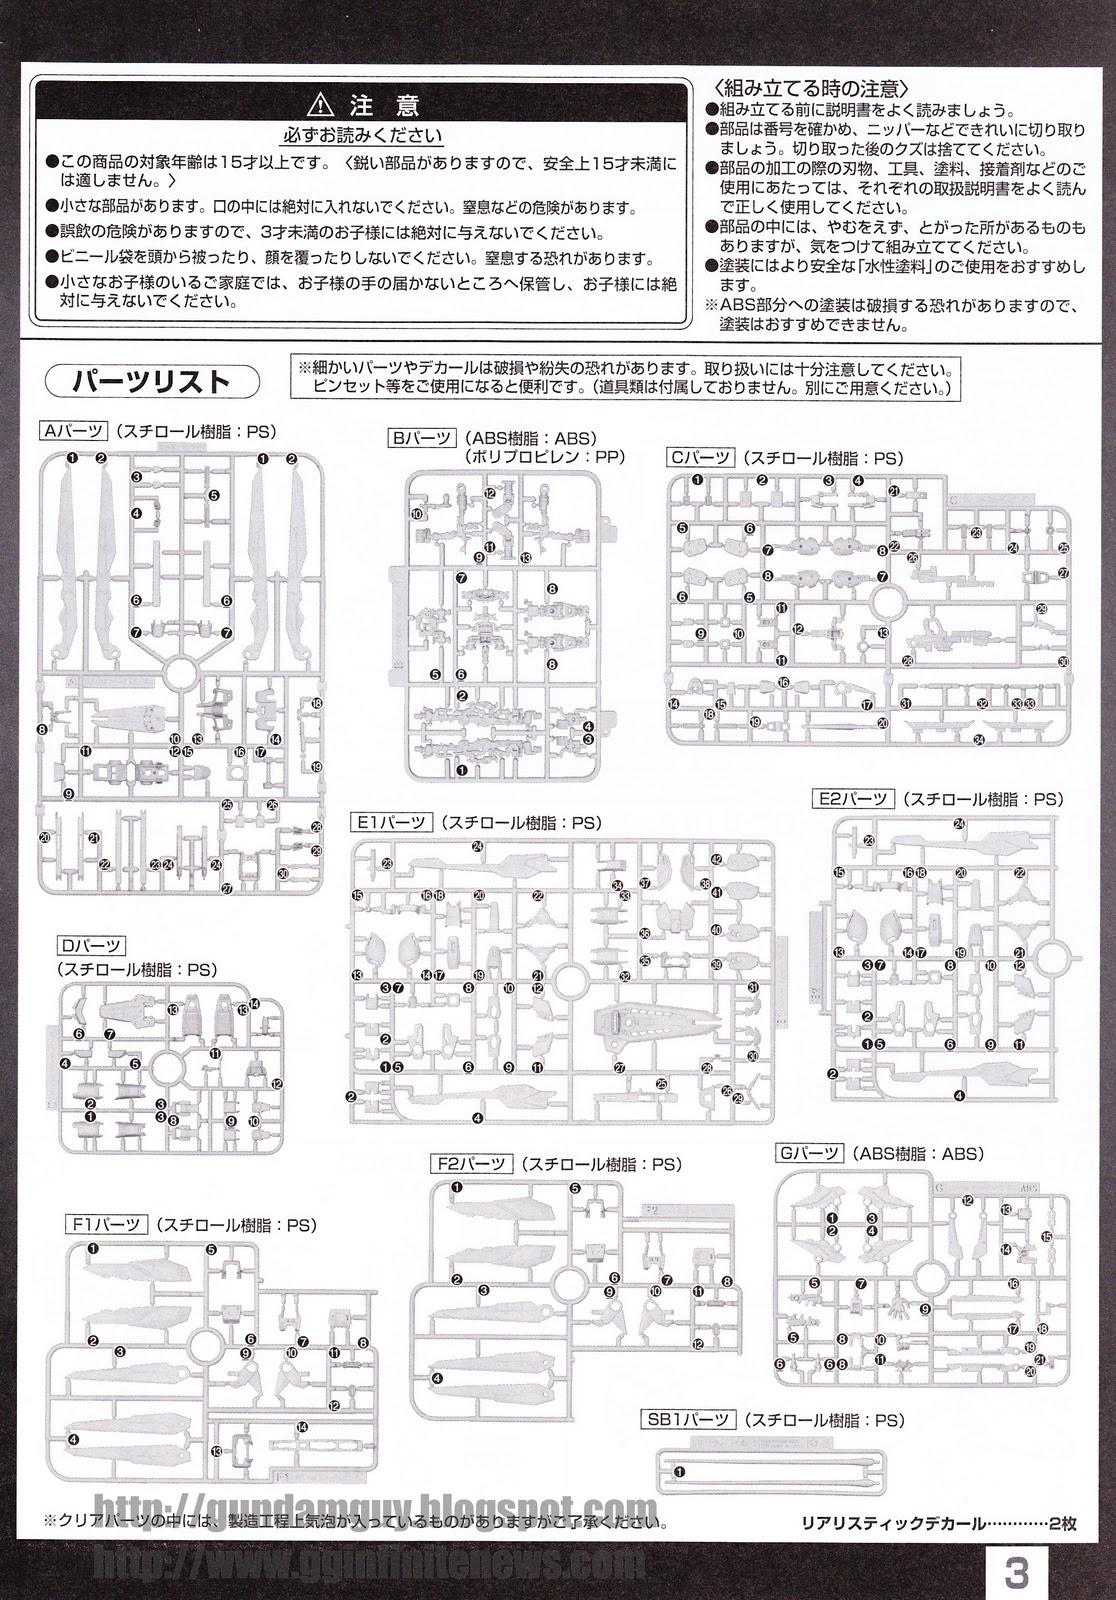 GUNDAM GUY: RG 1/144 ZGMF-X10A Freedom Gundam